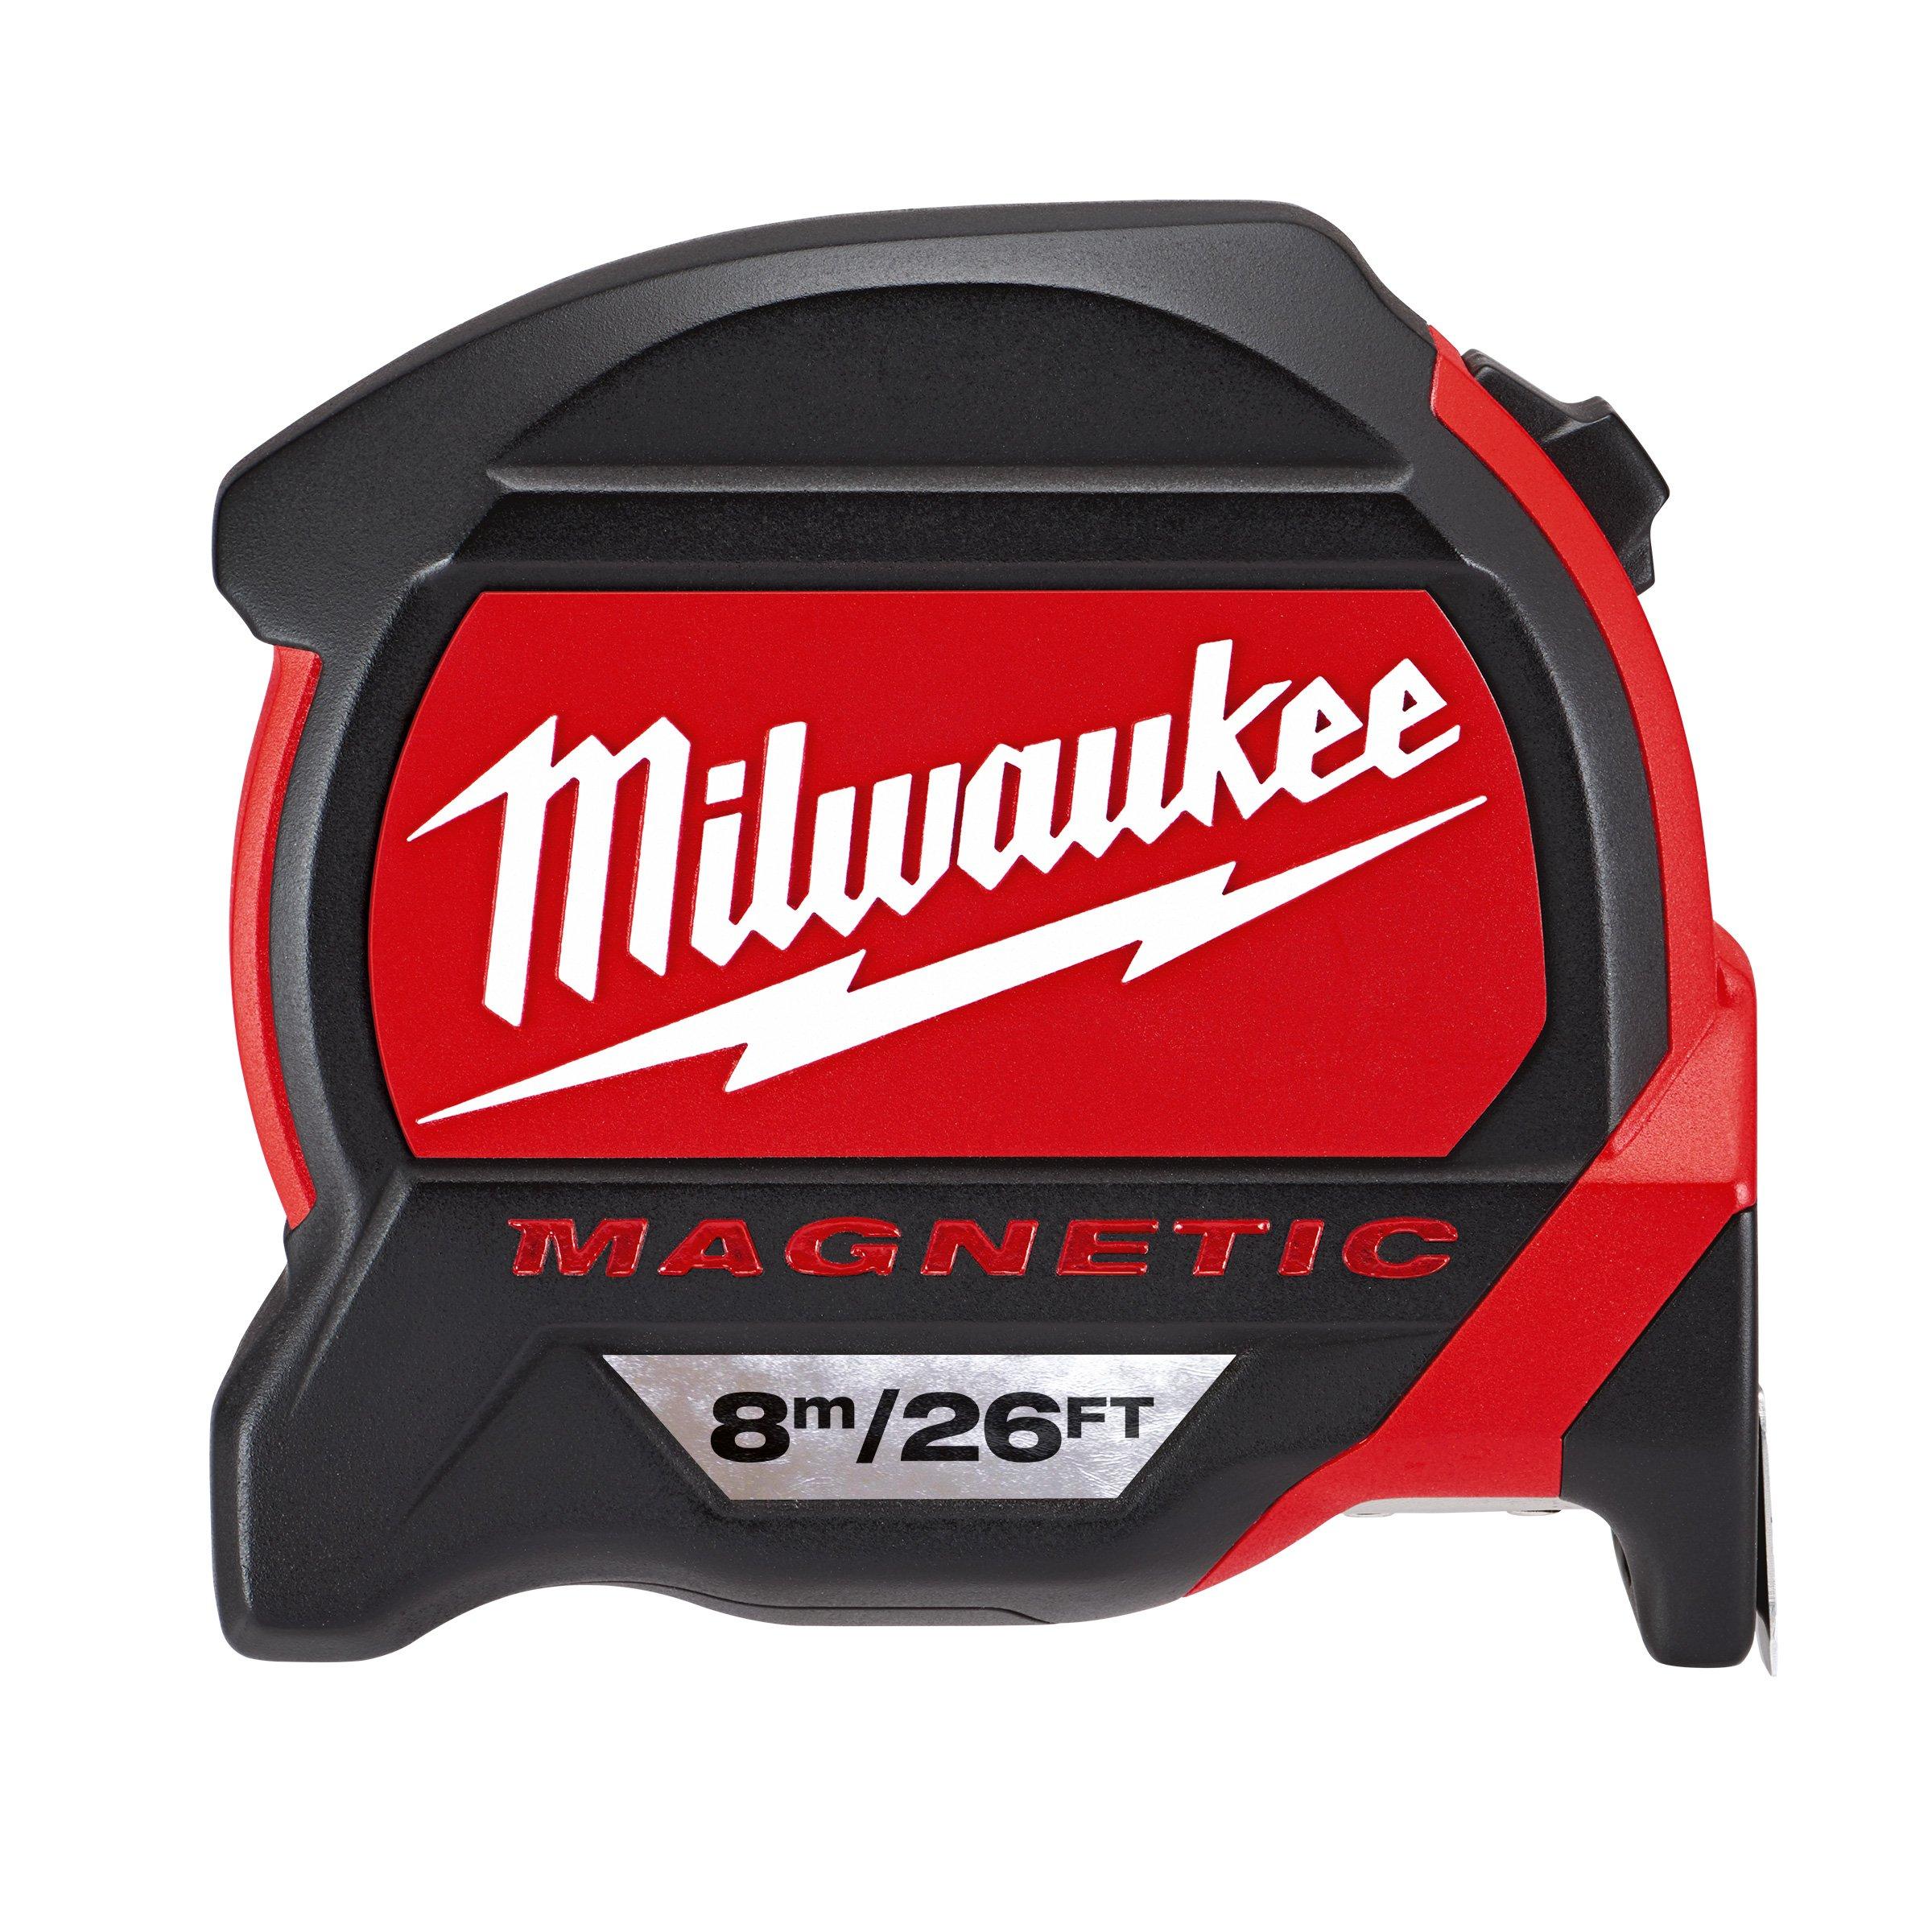 Milwaukee 8 m/26 ft. Premium Magnetic Tape Measure